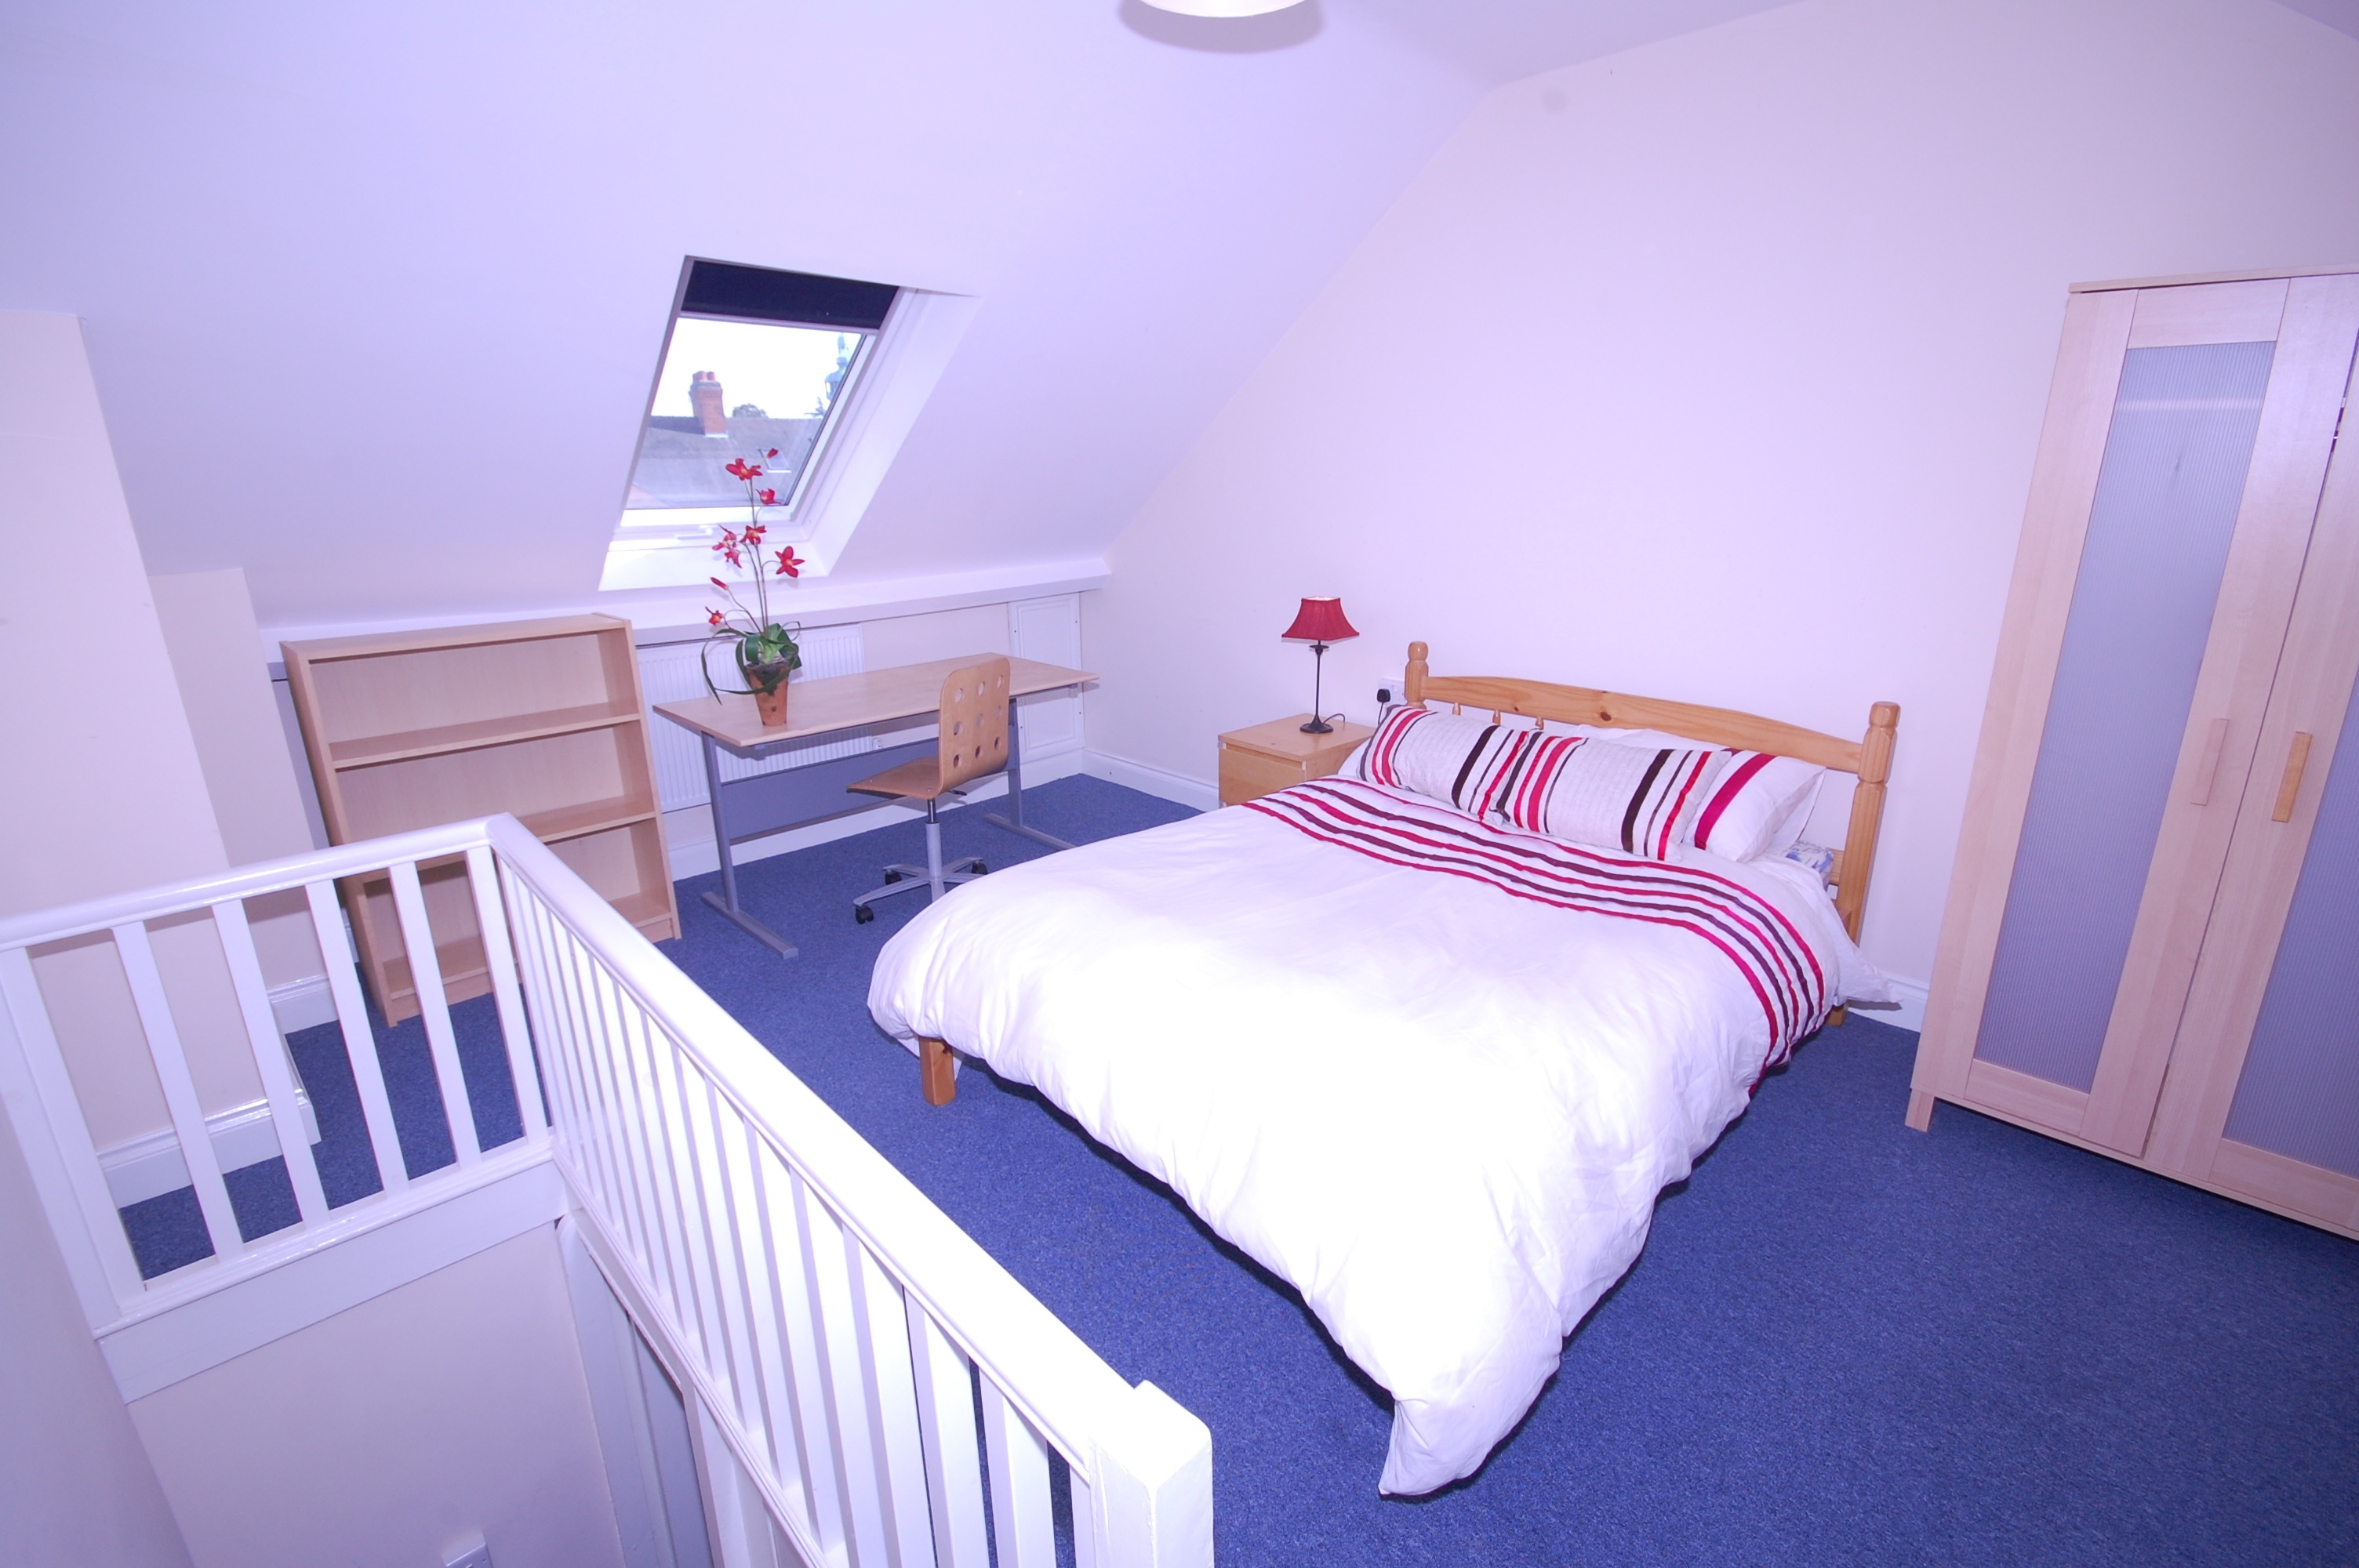 Stylish Design Attic Bedroom Interior (View 21 of 23)